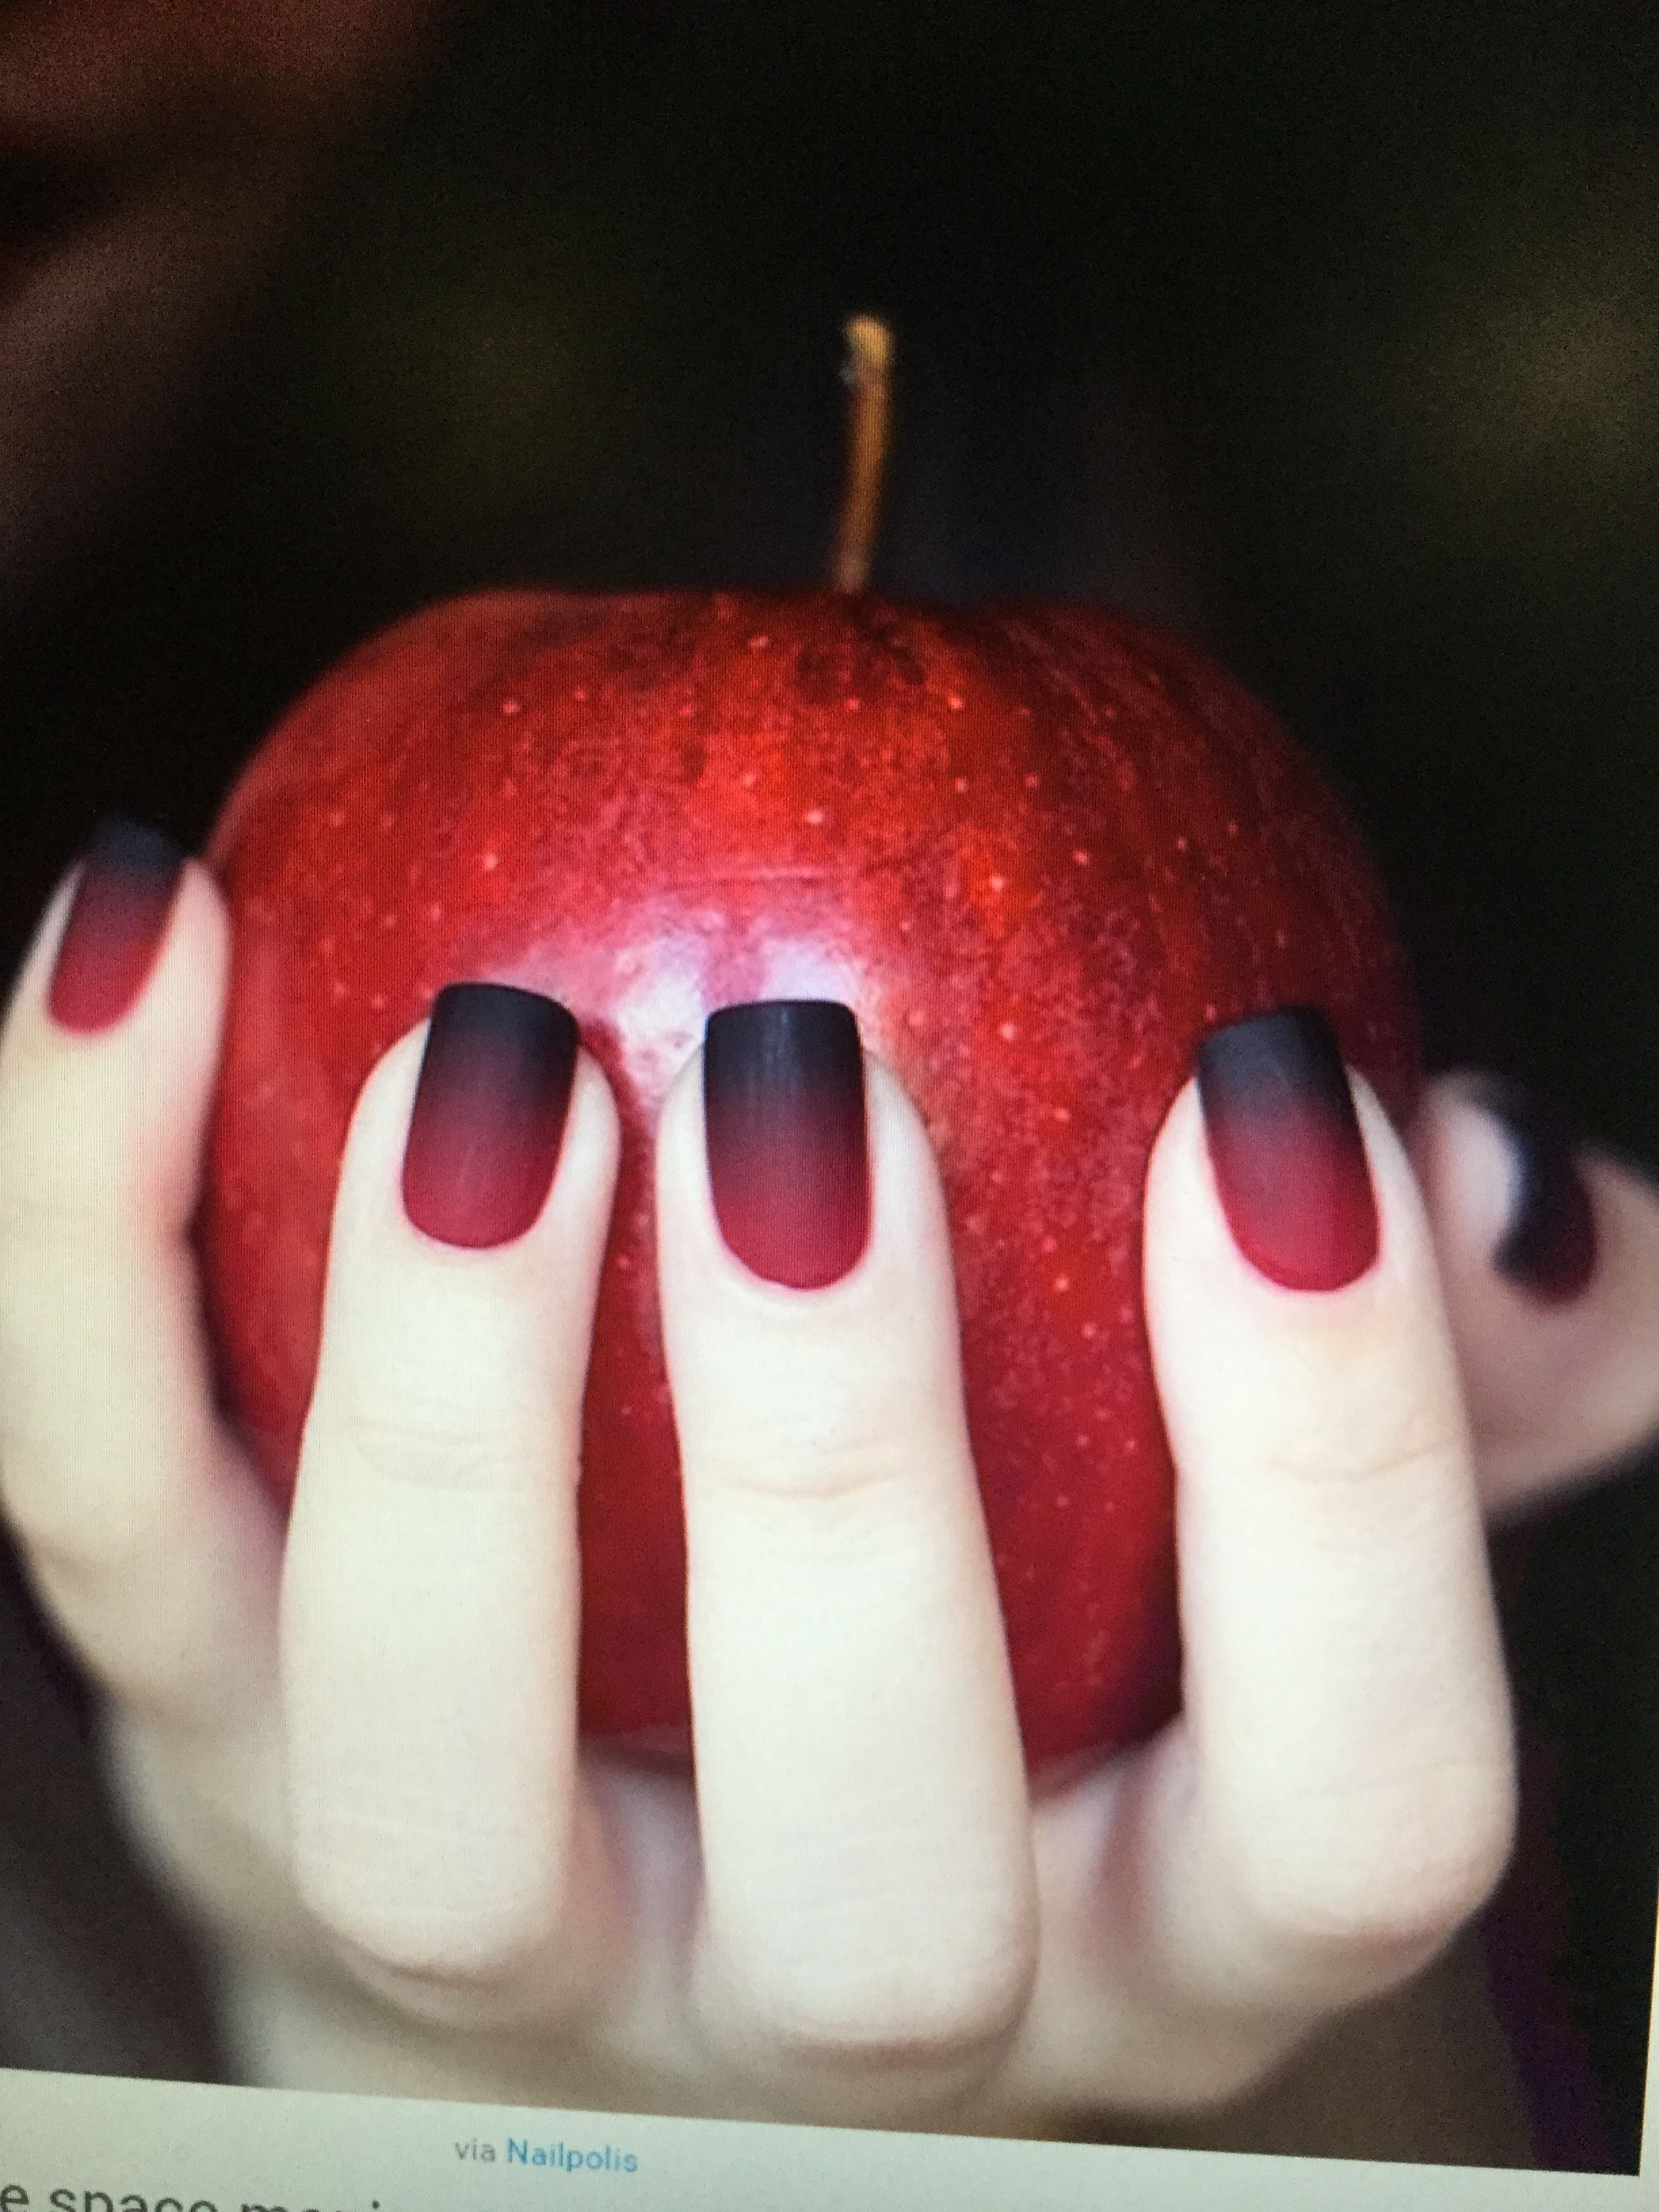 Degraded | Bella | Pinterest | Fingernail polish designs, Manicure ...